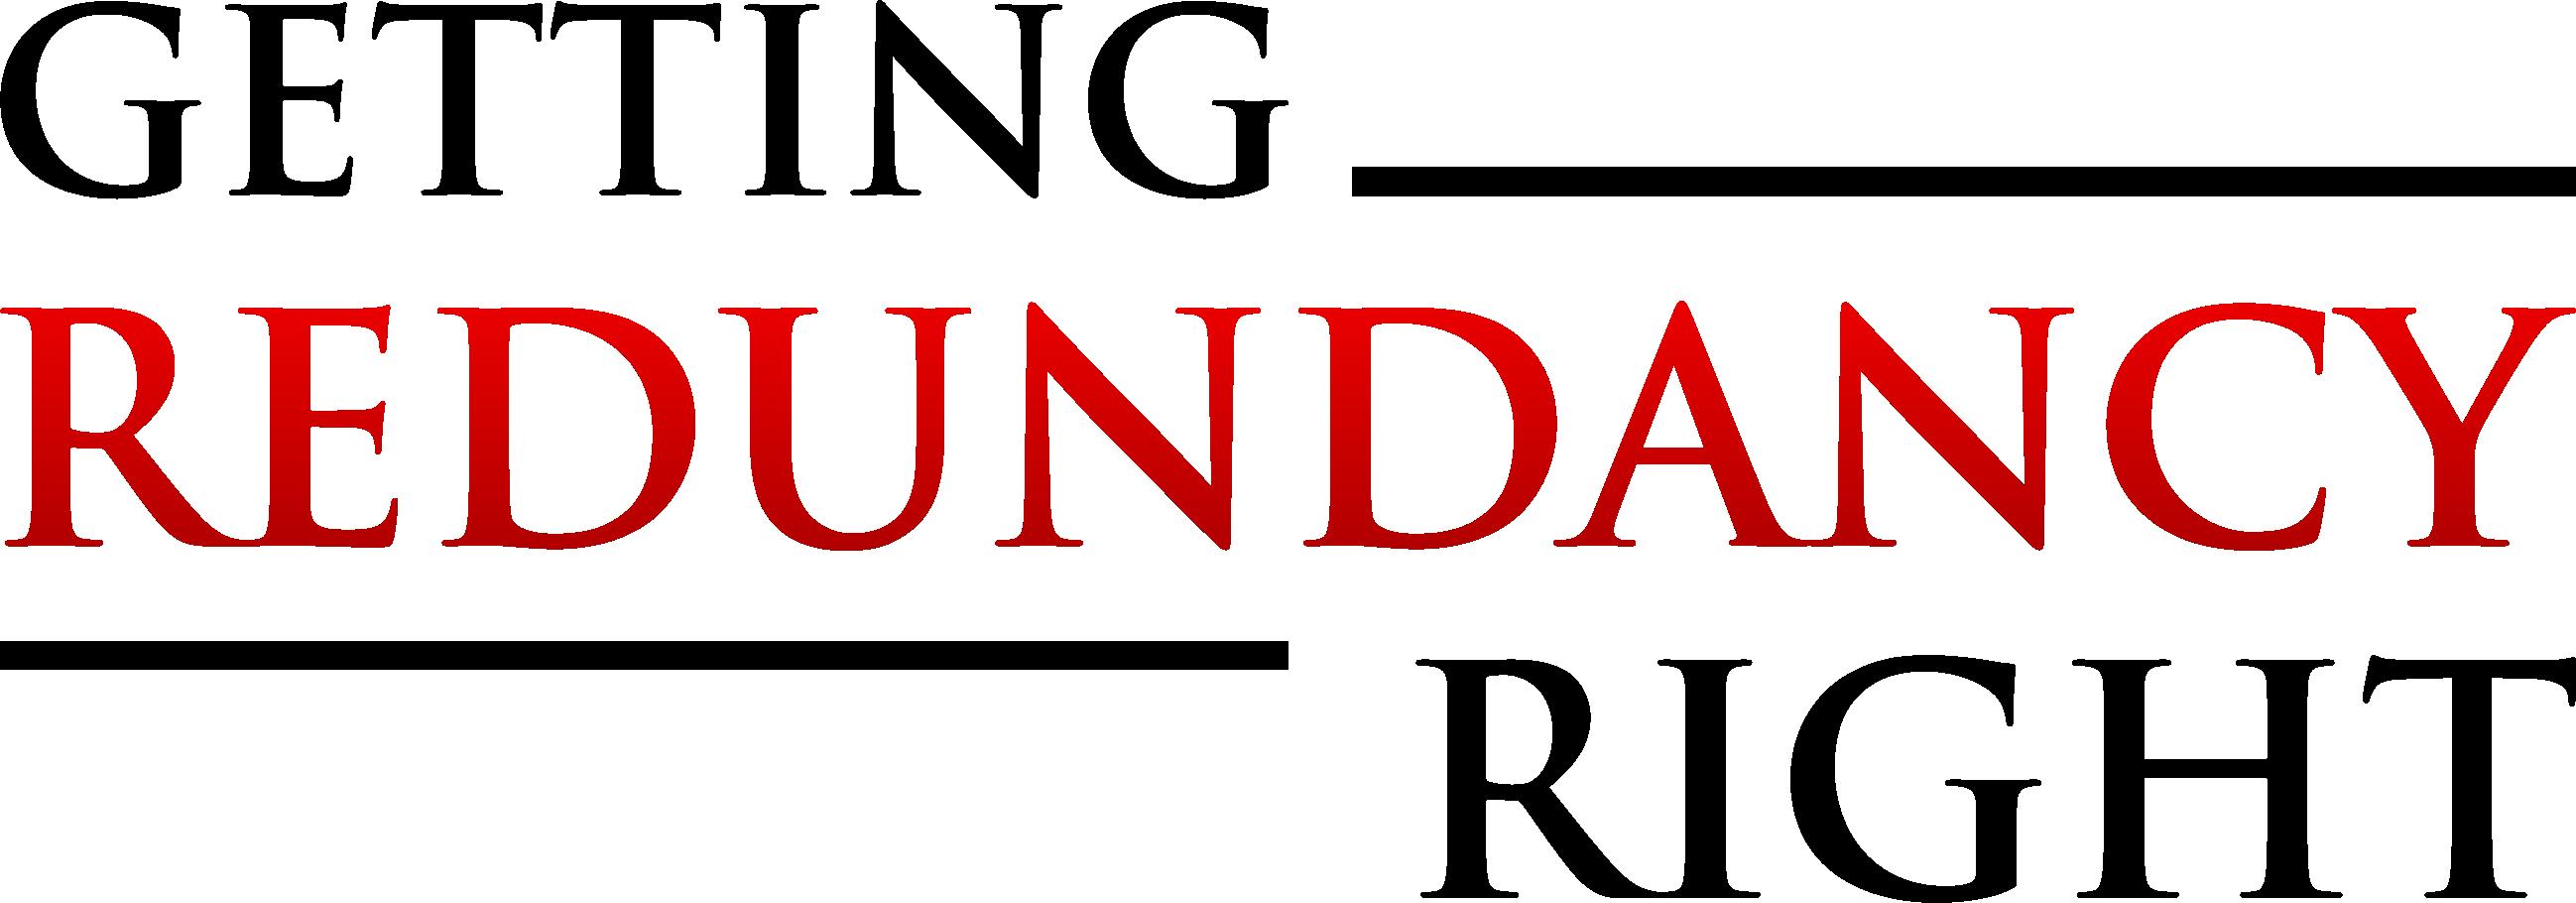 Getting Redundancy Right Logo